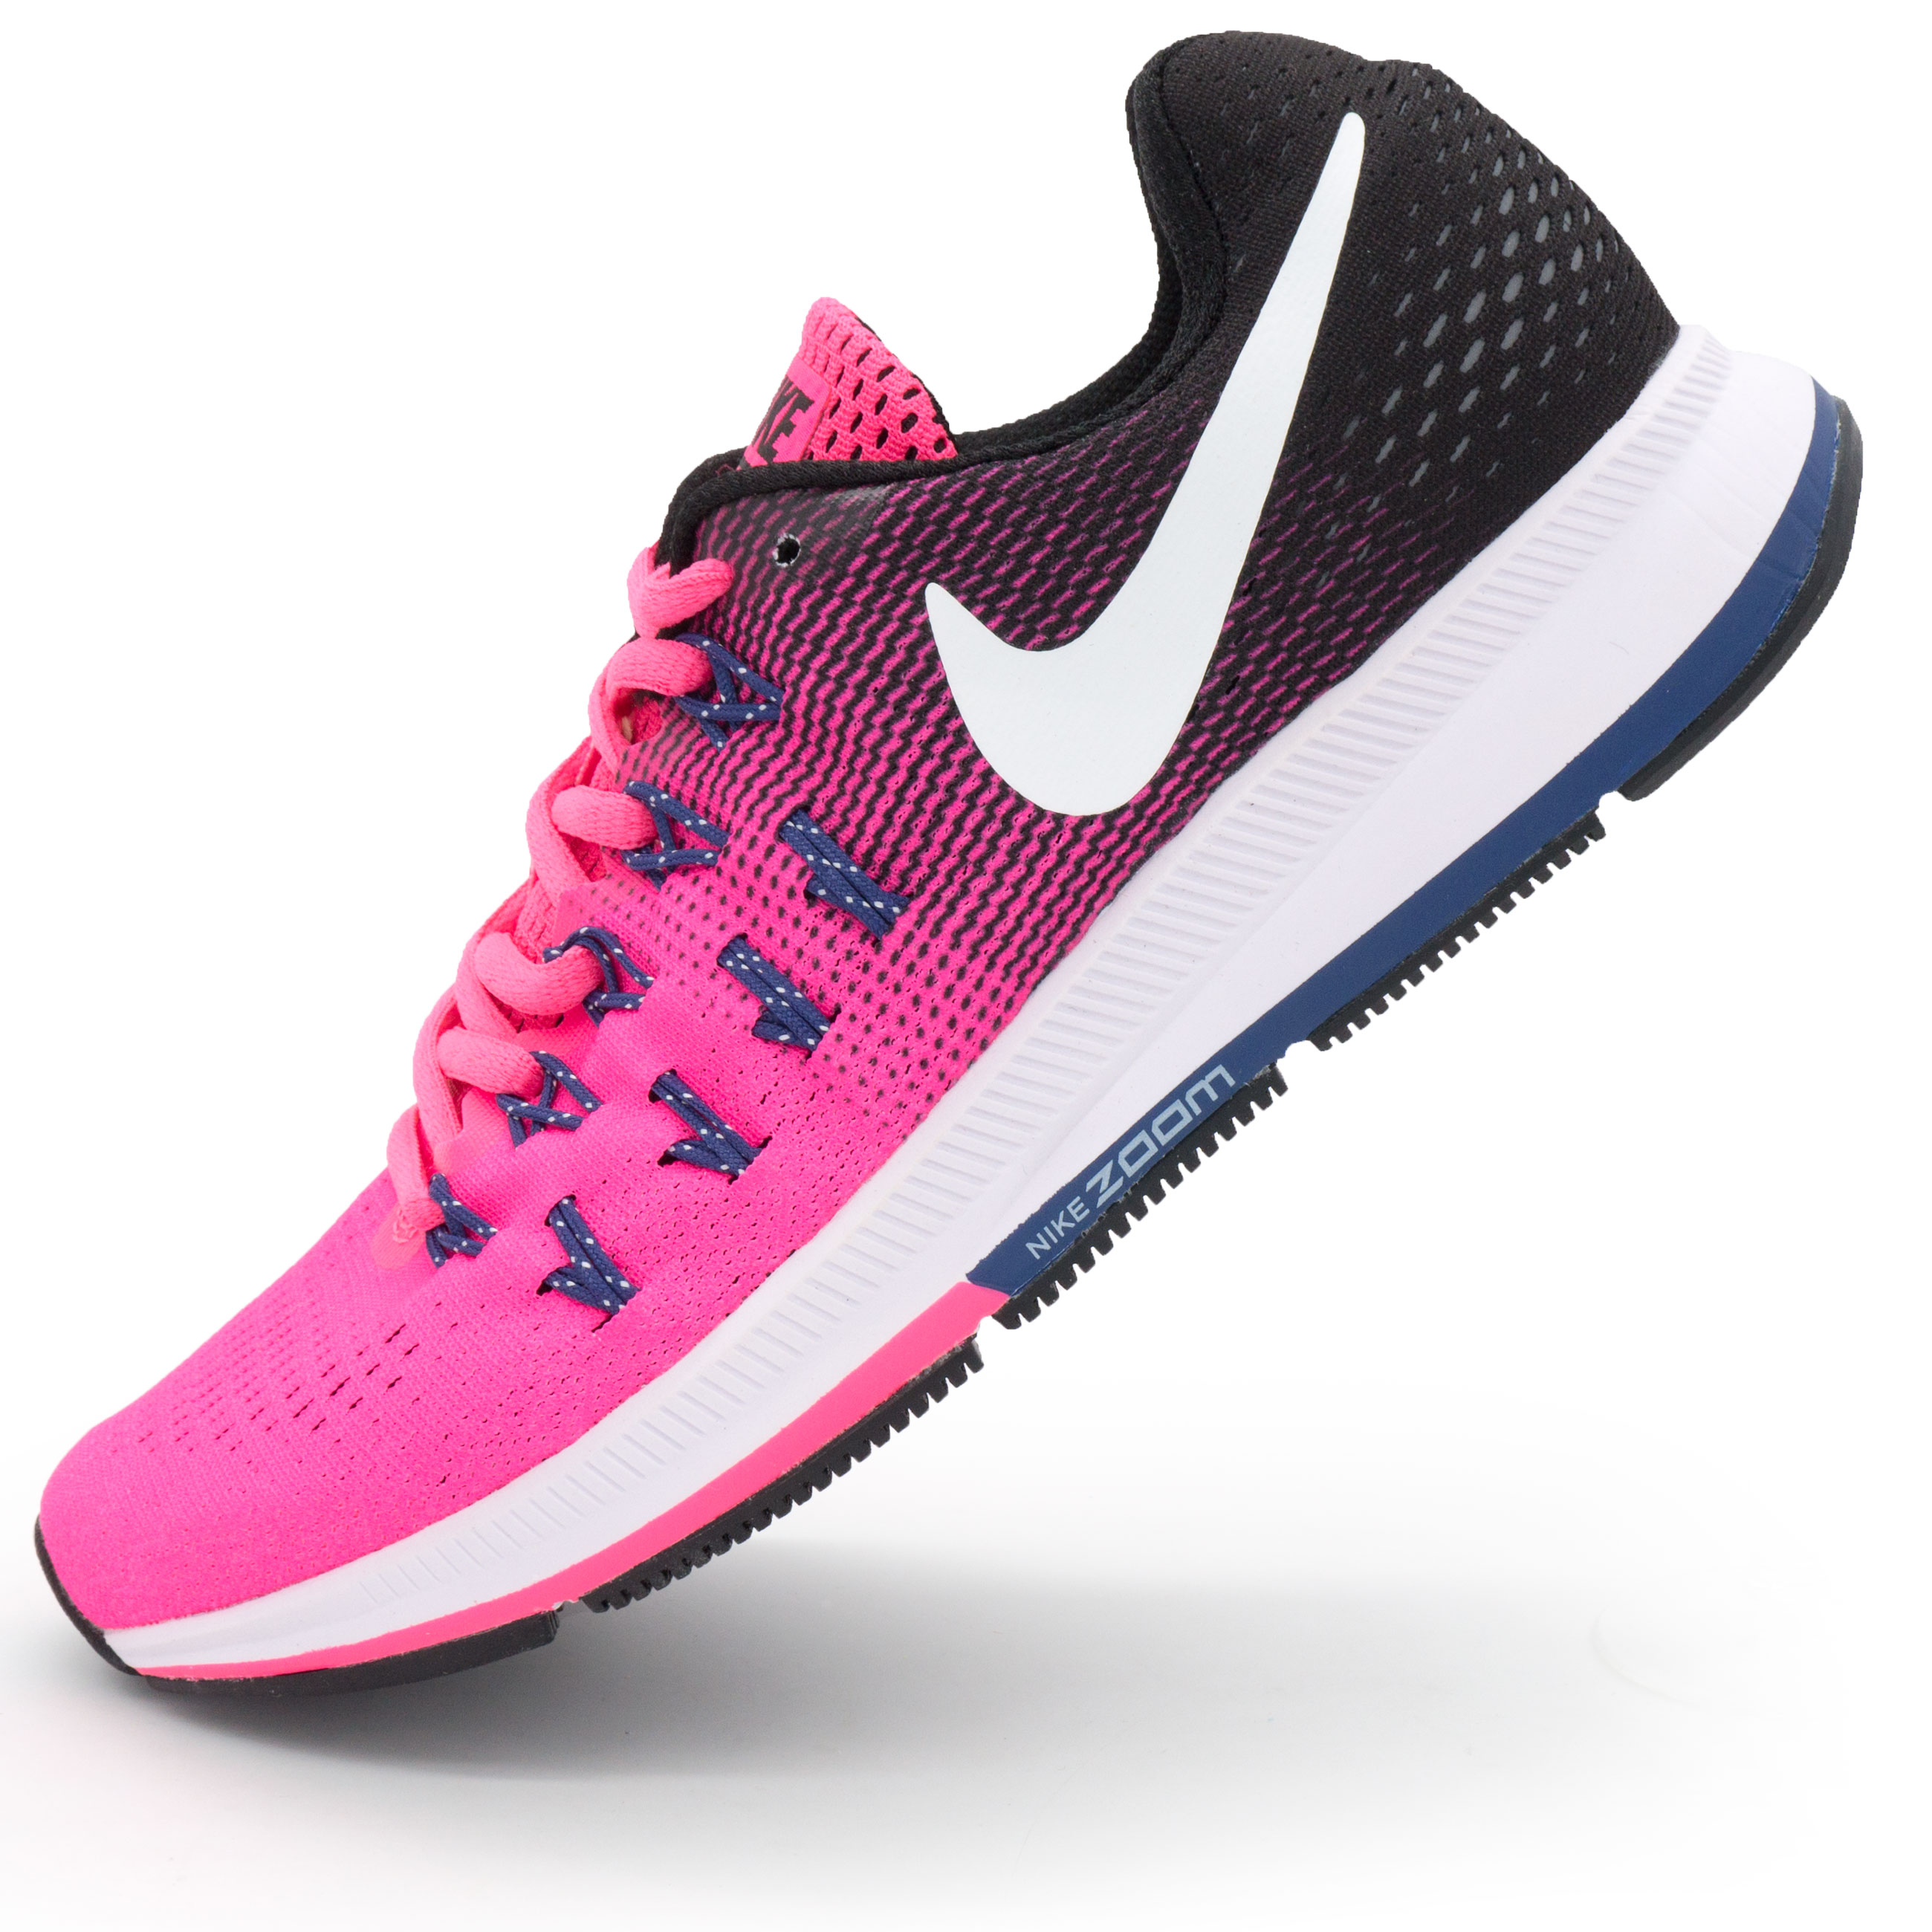 фото main Женские кроссовки для бега Nike Zoom Pegasus 33 темно-розовые. Топ качество! main